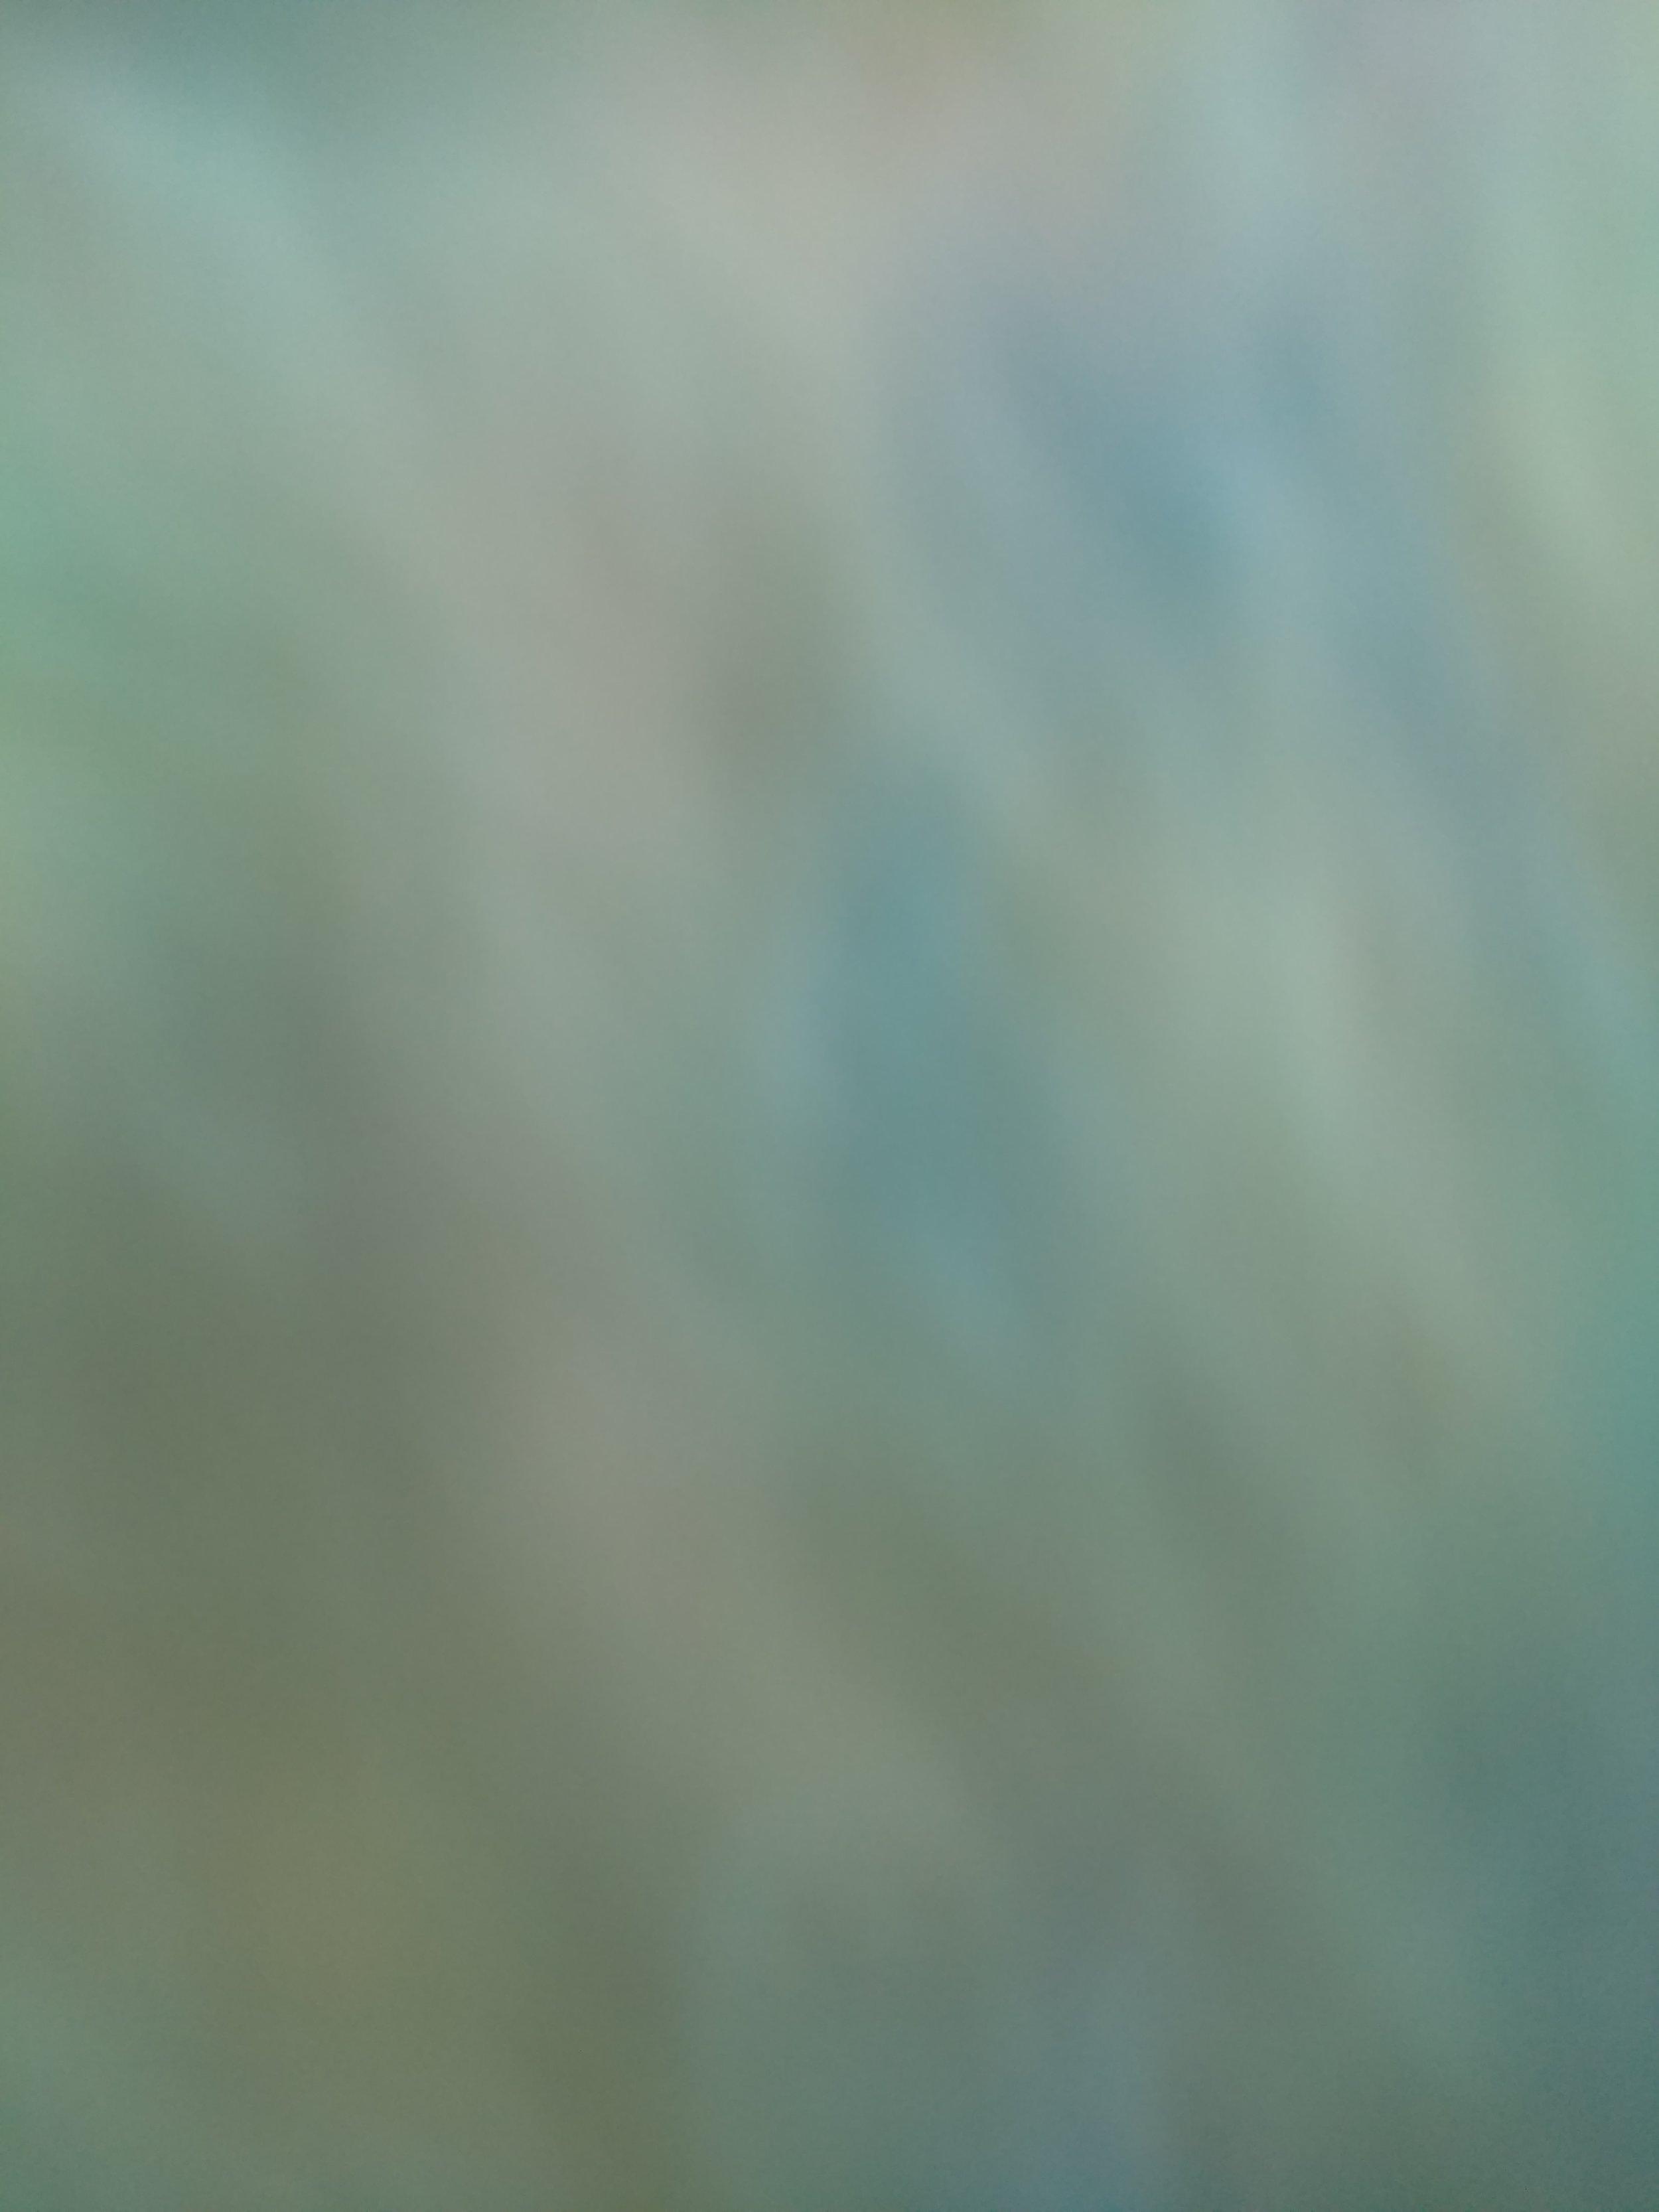 willroth-co-free-texture-gradient-047.jpg